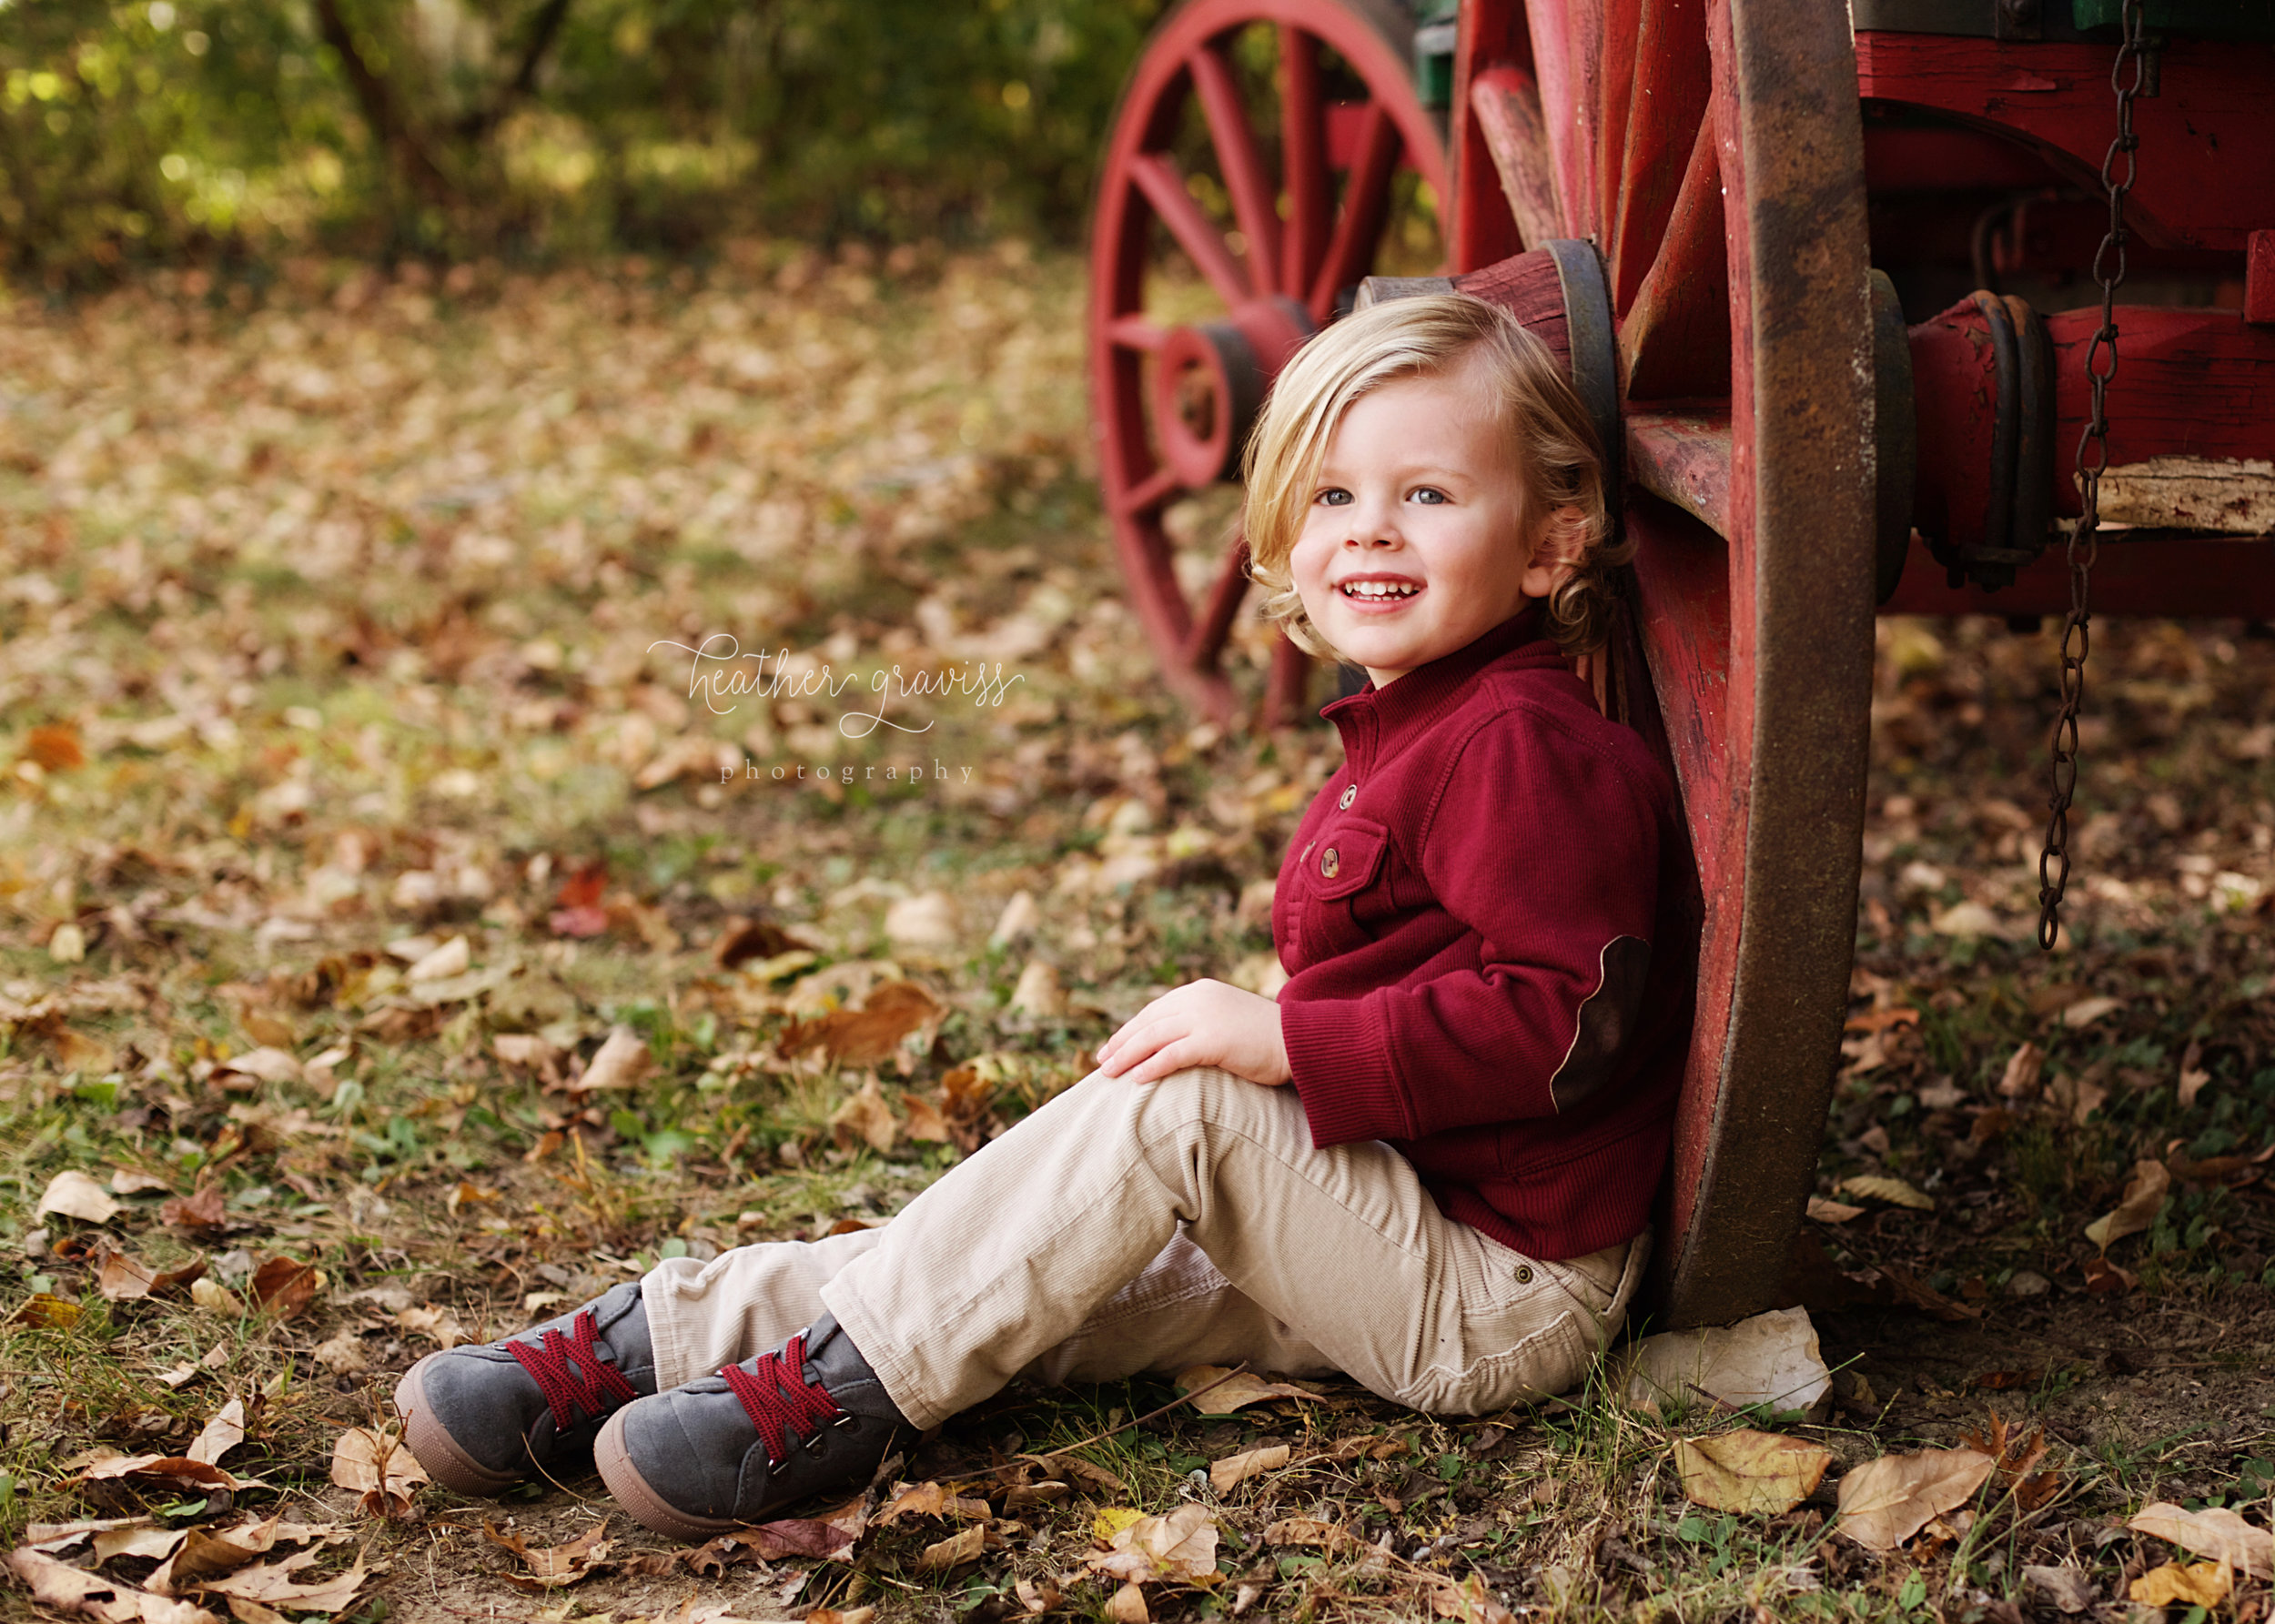 wagon-wheel-portrait.jpg